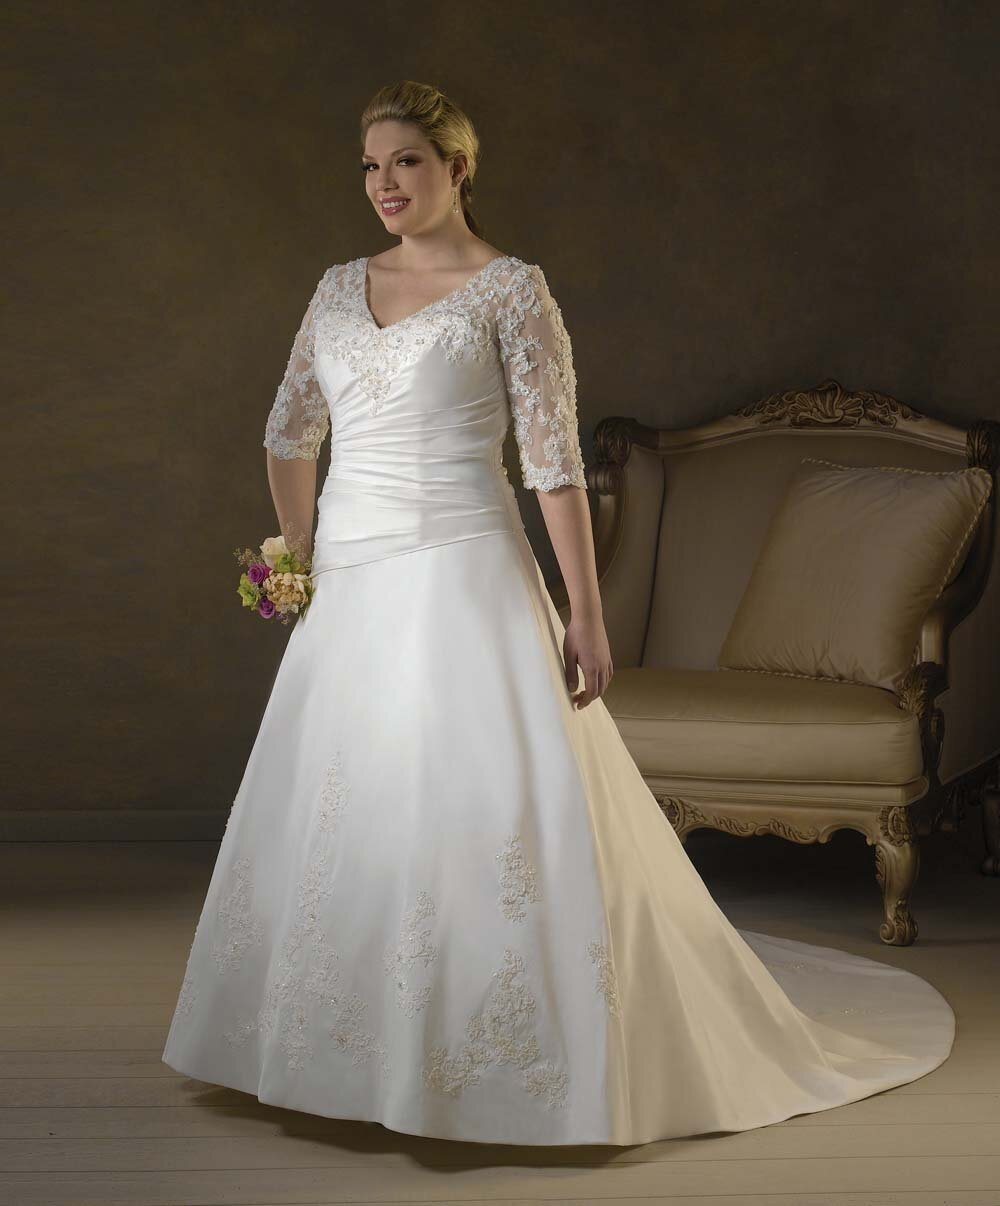 Plus Size Retro Wedding Dresses Pictures Ideas Guide To Buying Stylish Wedding Dresses